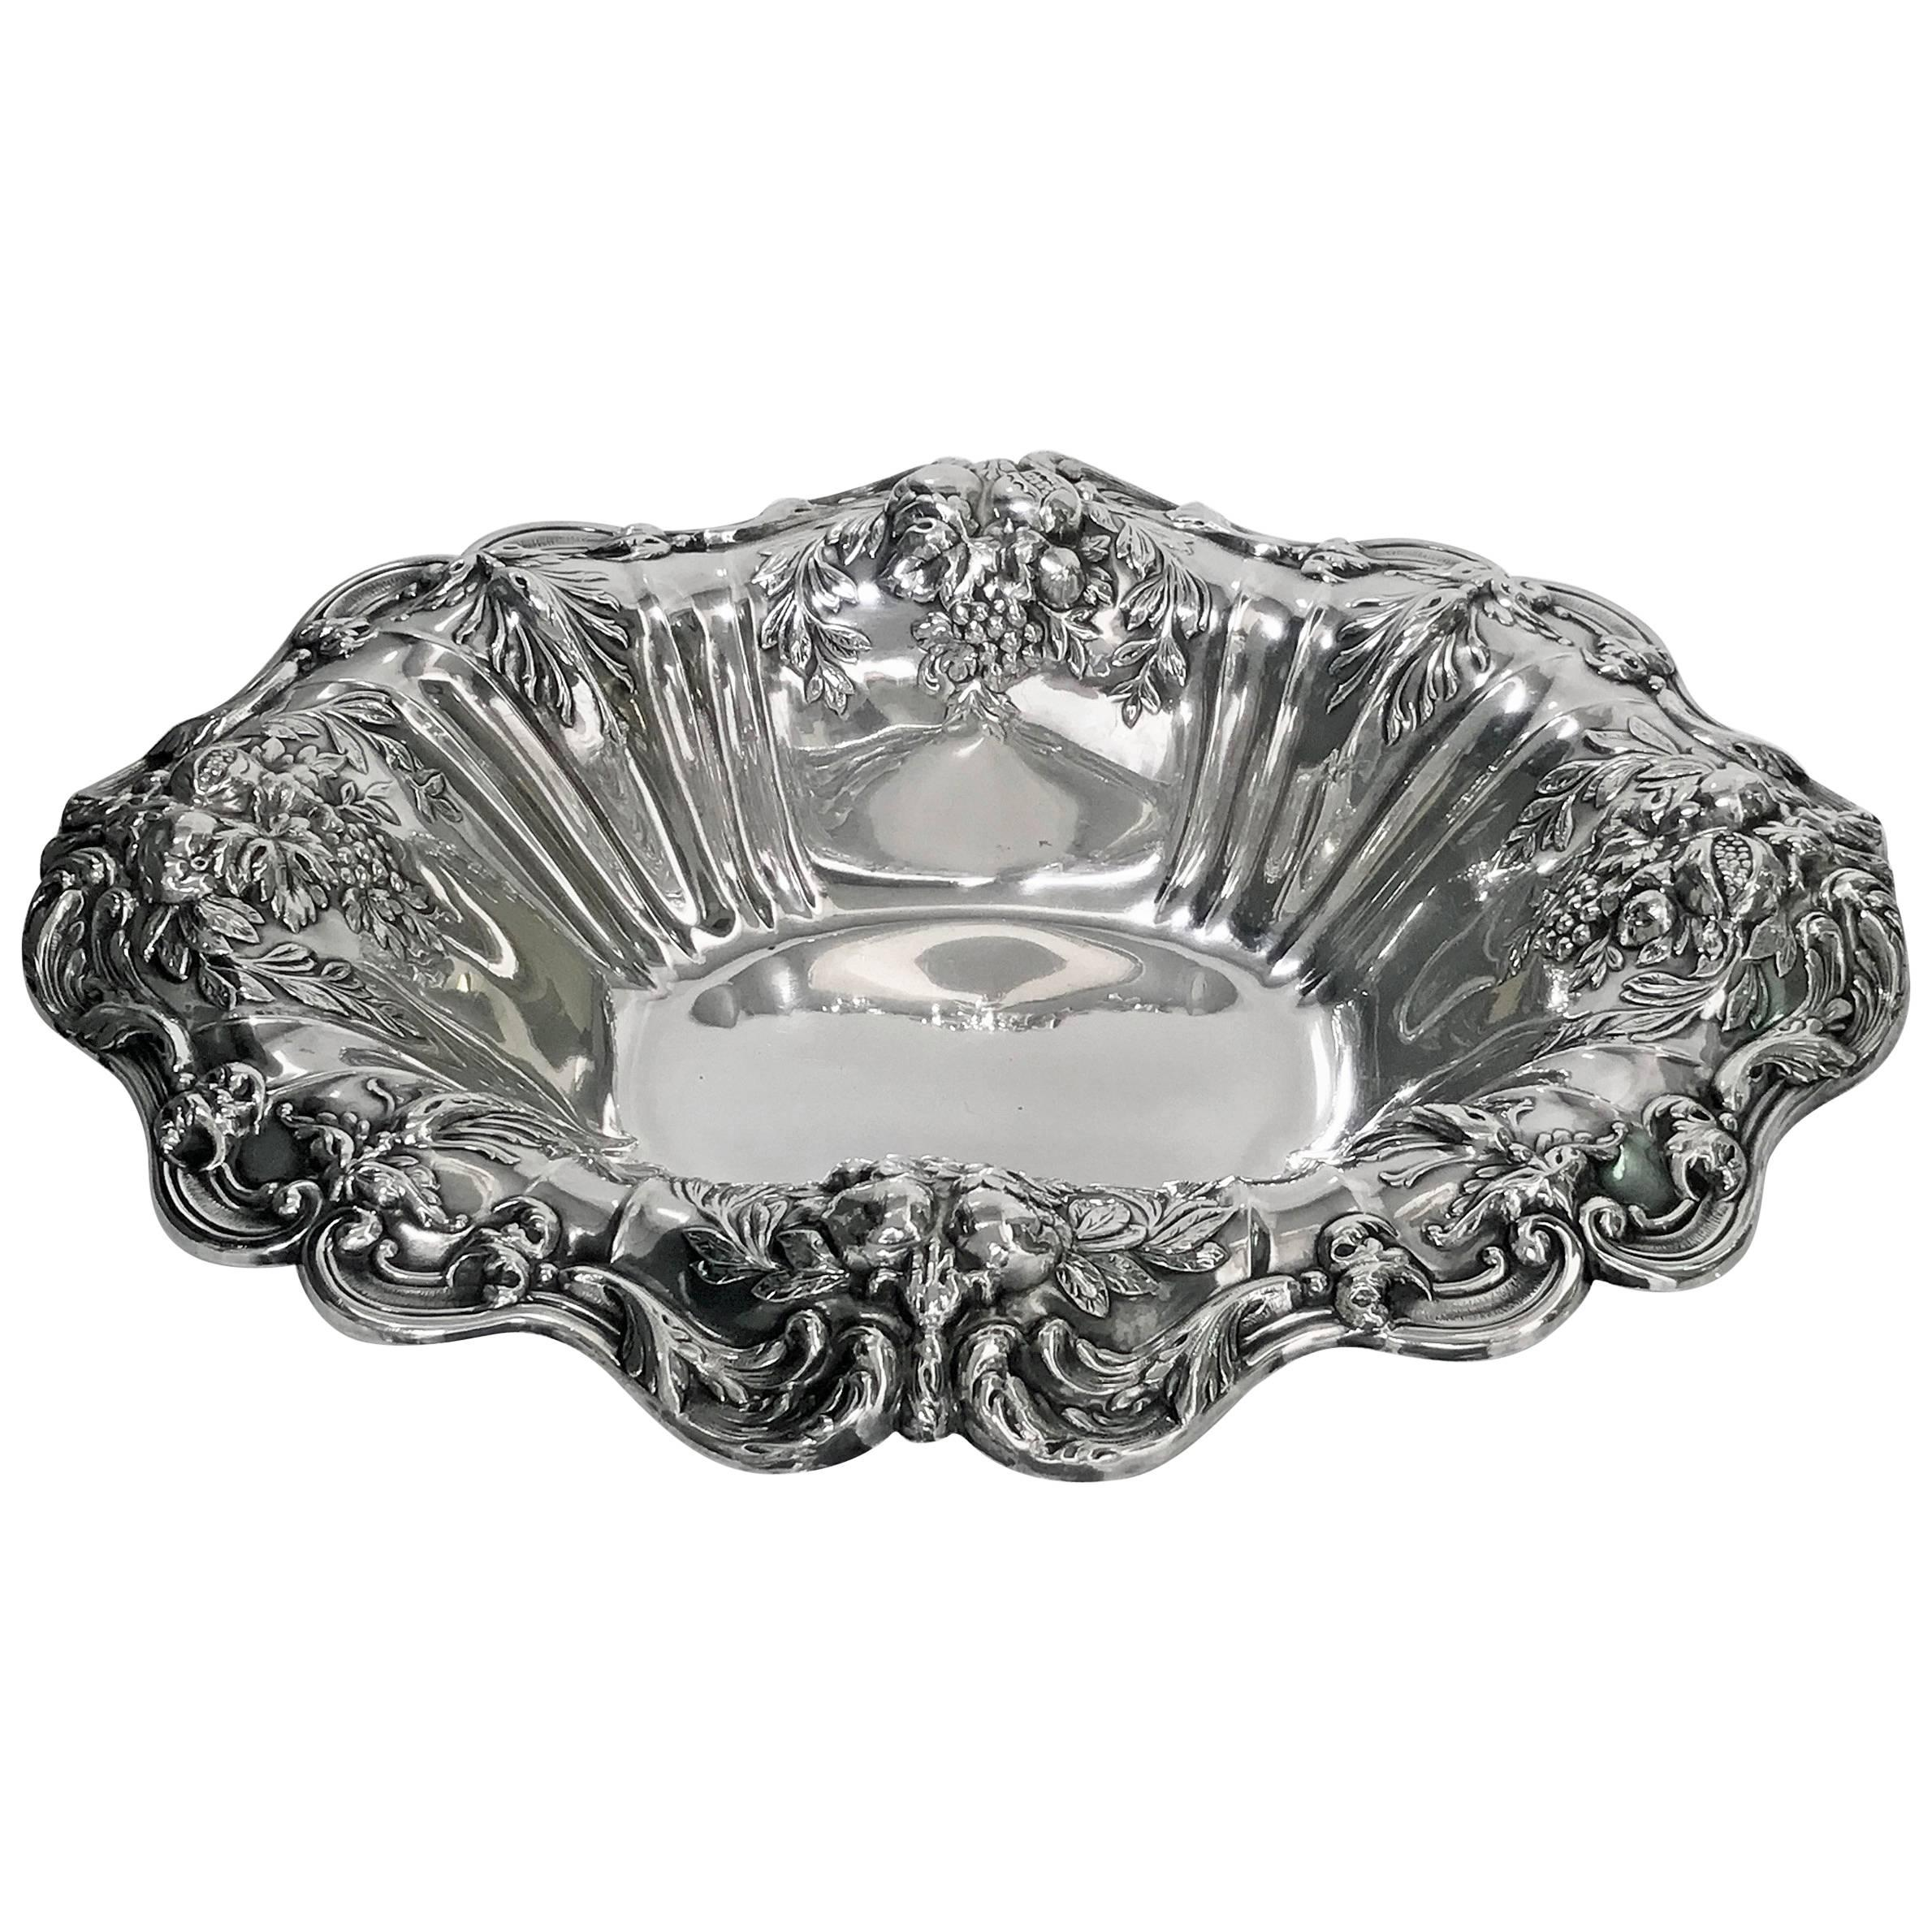 Reed & Barton Francis Sterling Silver Large Dish, 1955